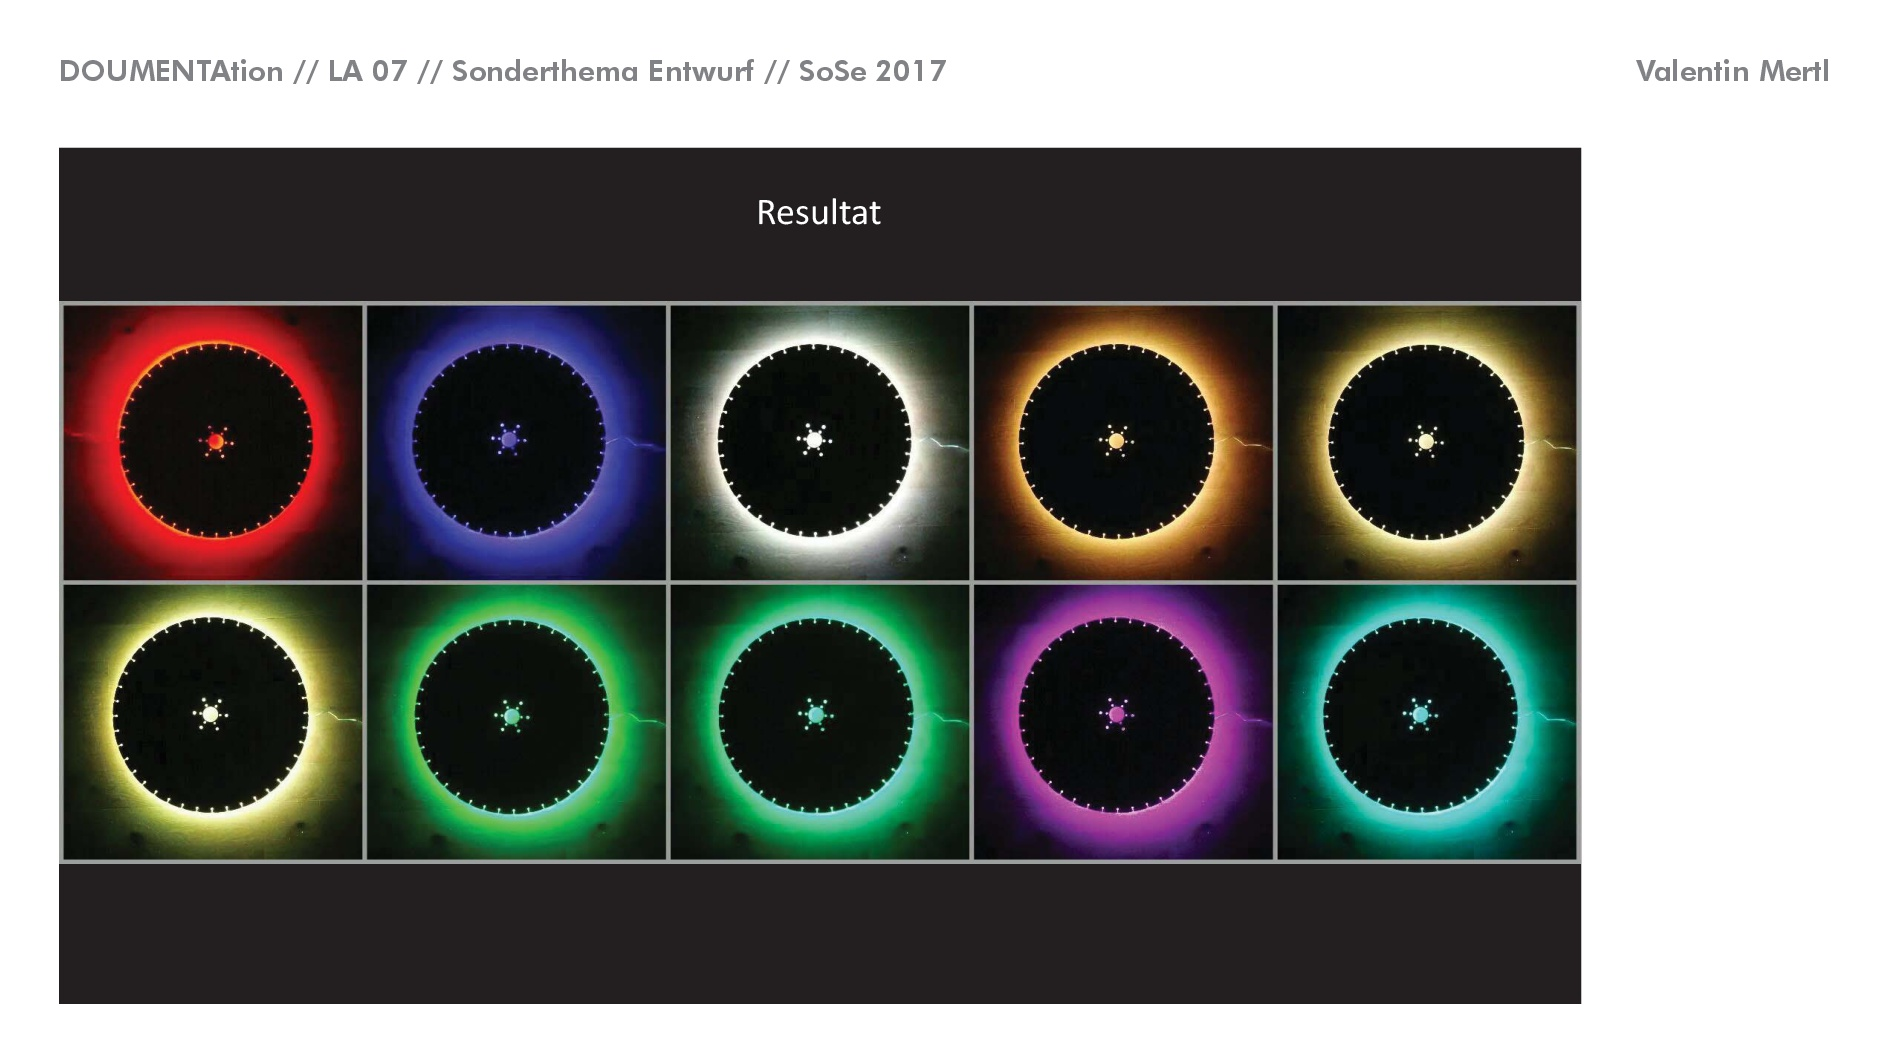 NEU Sonderthema Entwerfen SoSe 17 015